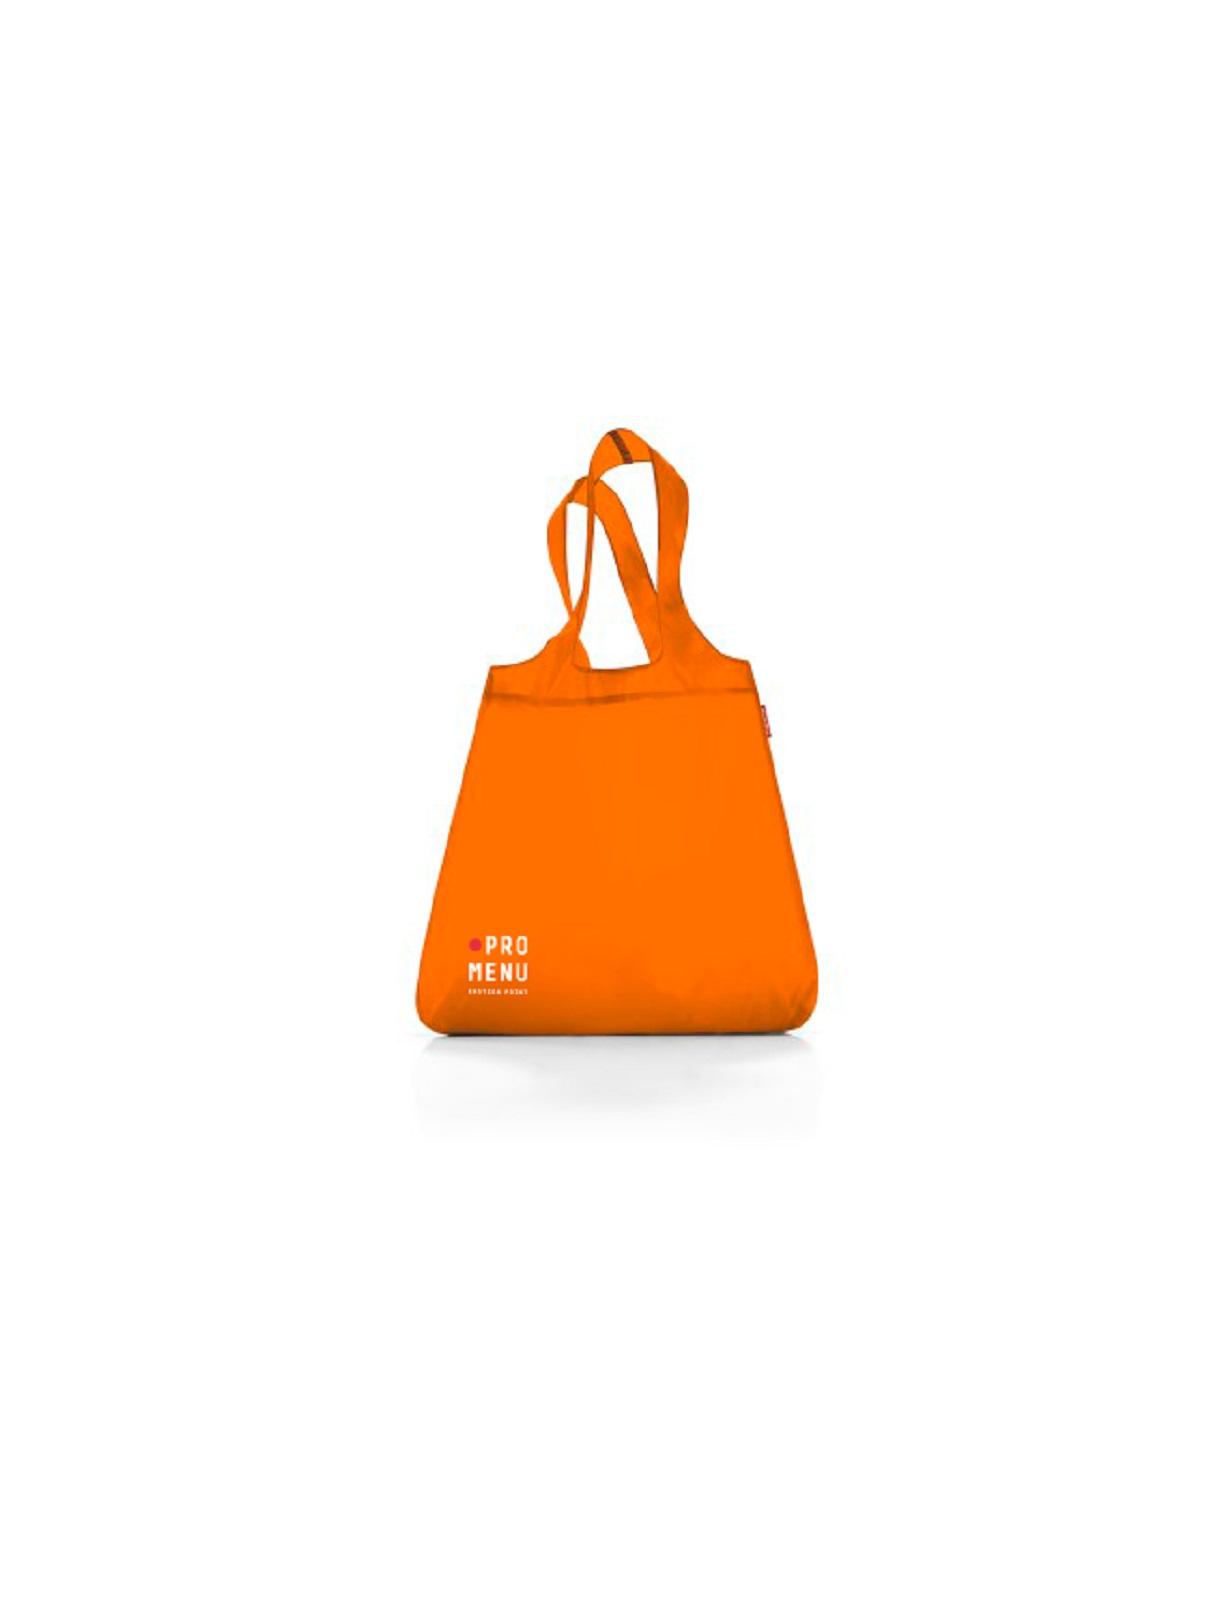 Сумка для шоппинга с лого Promenu Reisenthel Mini maxi shopper collection, 43,5 х 63 х 6 cм, цвет в ассортименте Reisenthel AT 0002LOGO фото 2